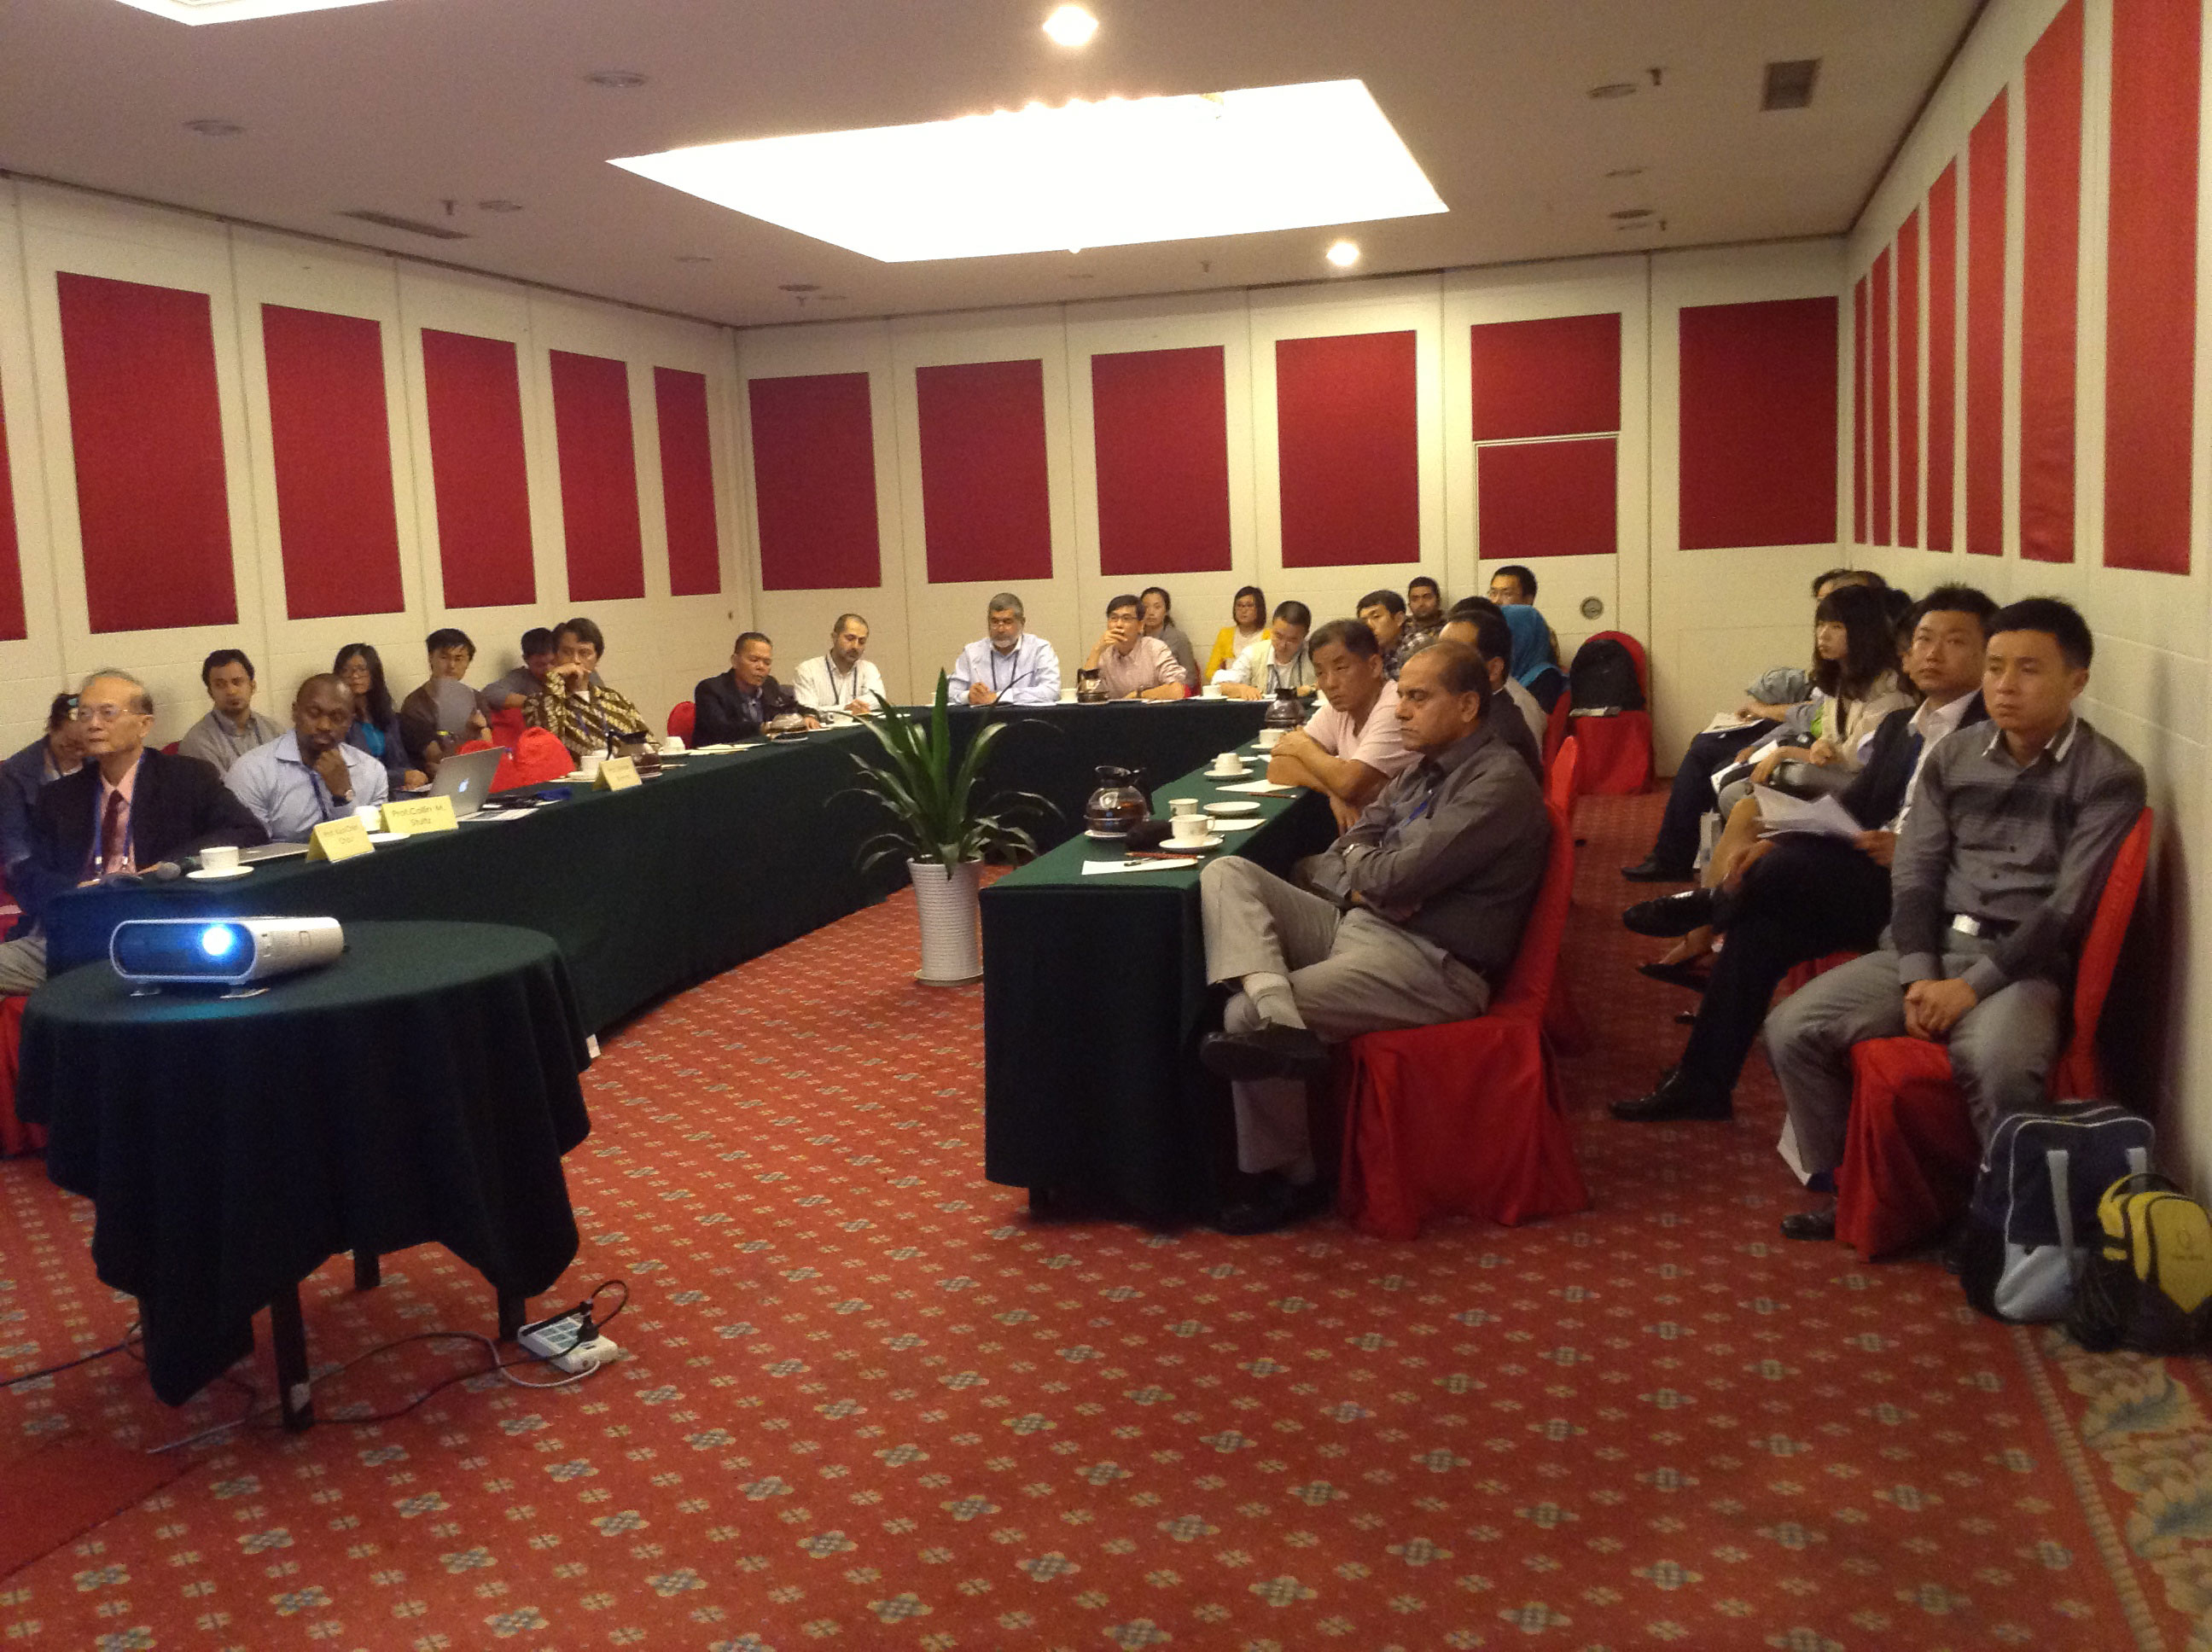 Plenary Session B